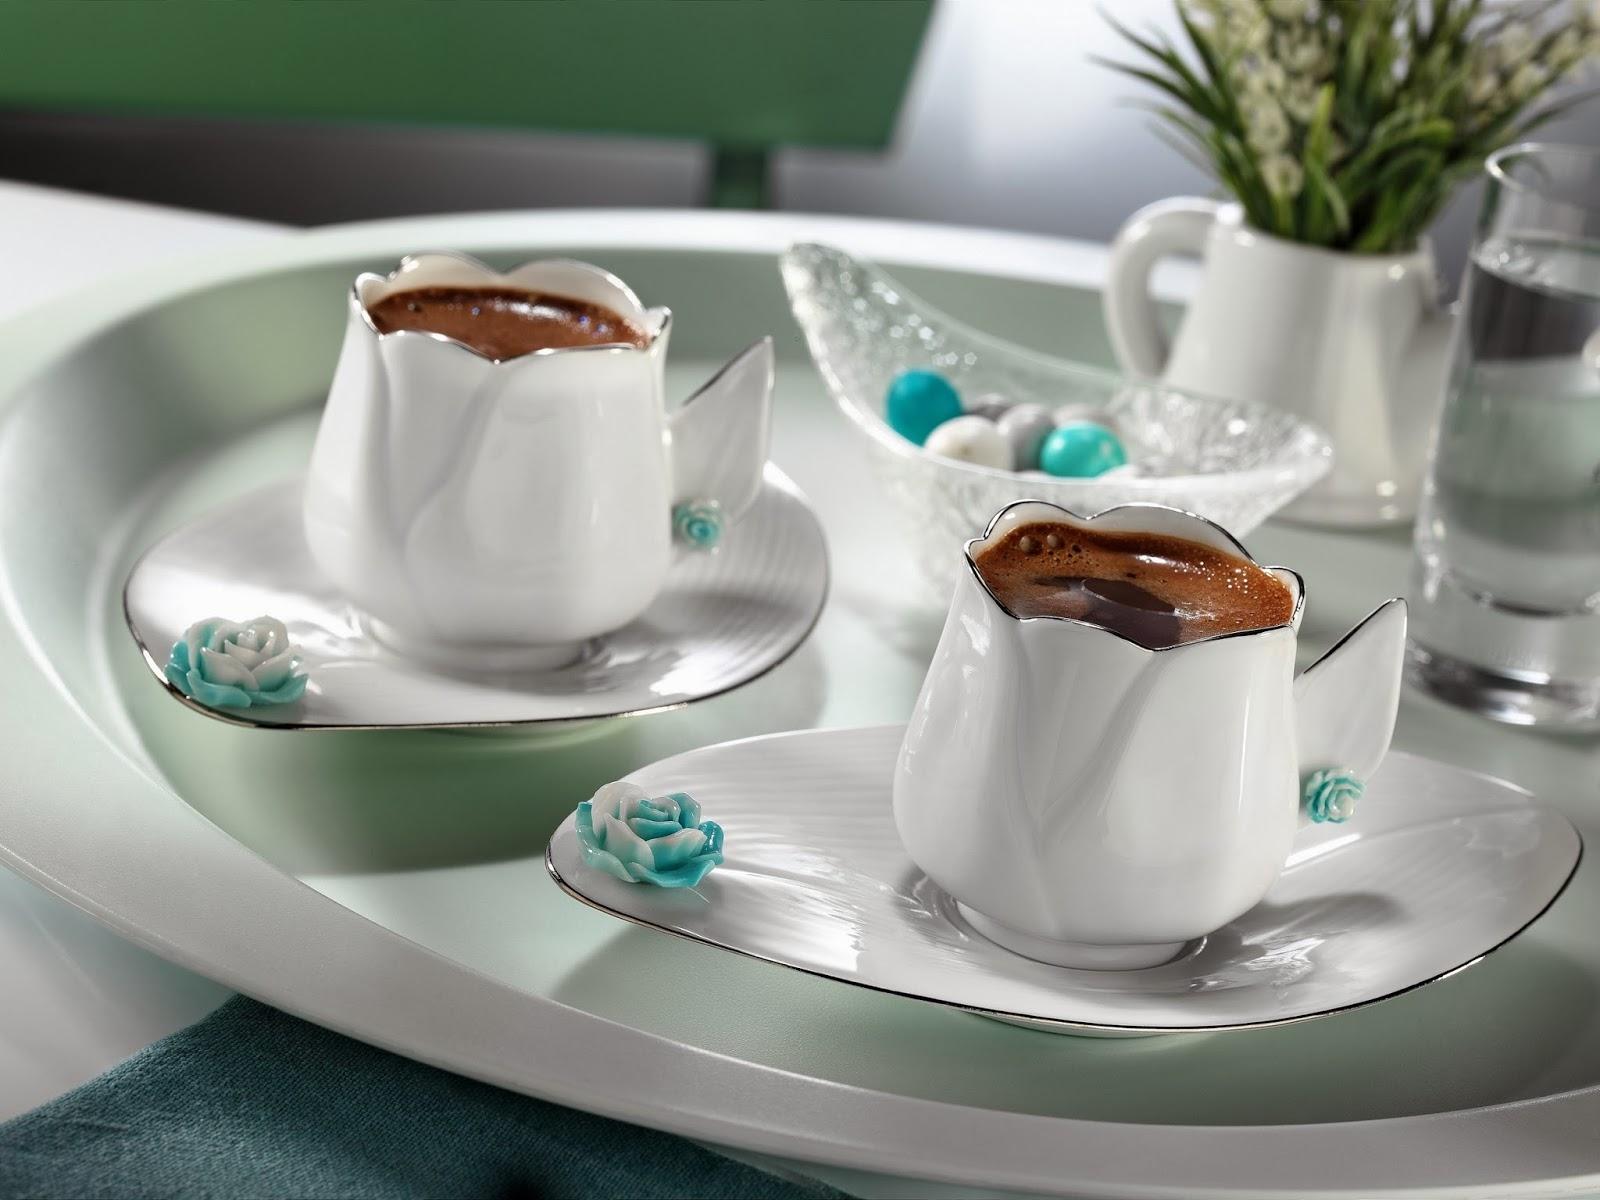 Gönül Ne Kahve İster Ne Kahvehane Gönül Sohbet İster Kahve Bahane …